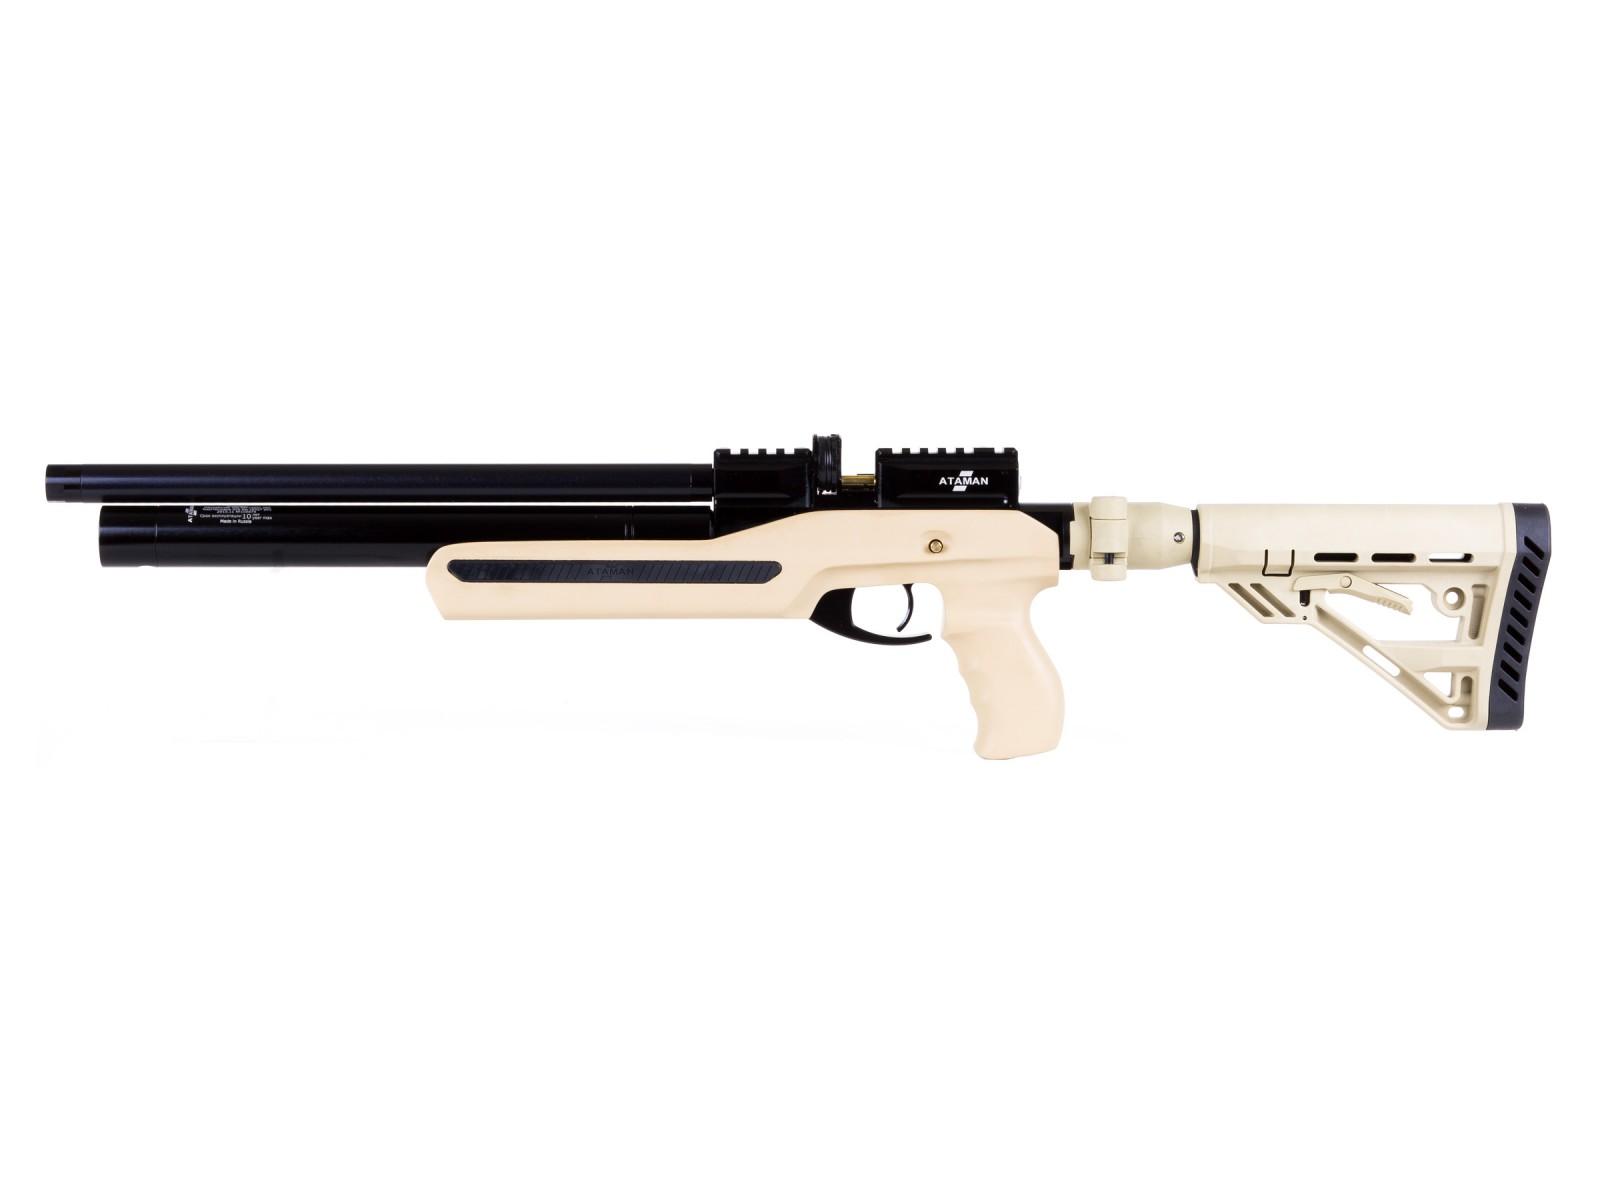 ataman limited editition m2r carbine ultra compact air rifle air rifles walther lp53 air pistol manual Walther Competition Air Pistols